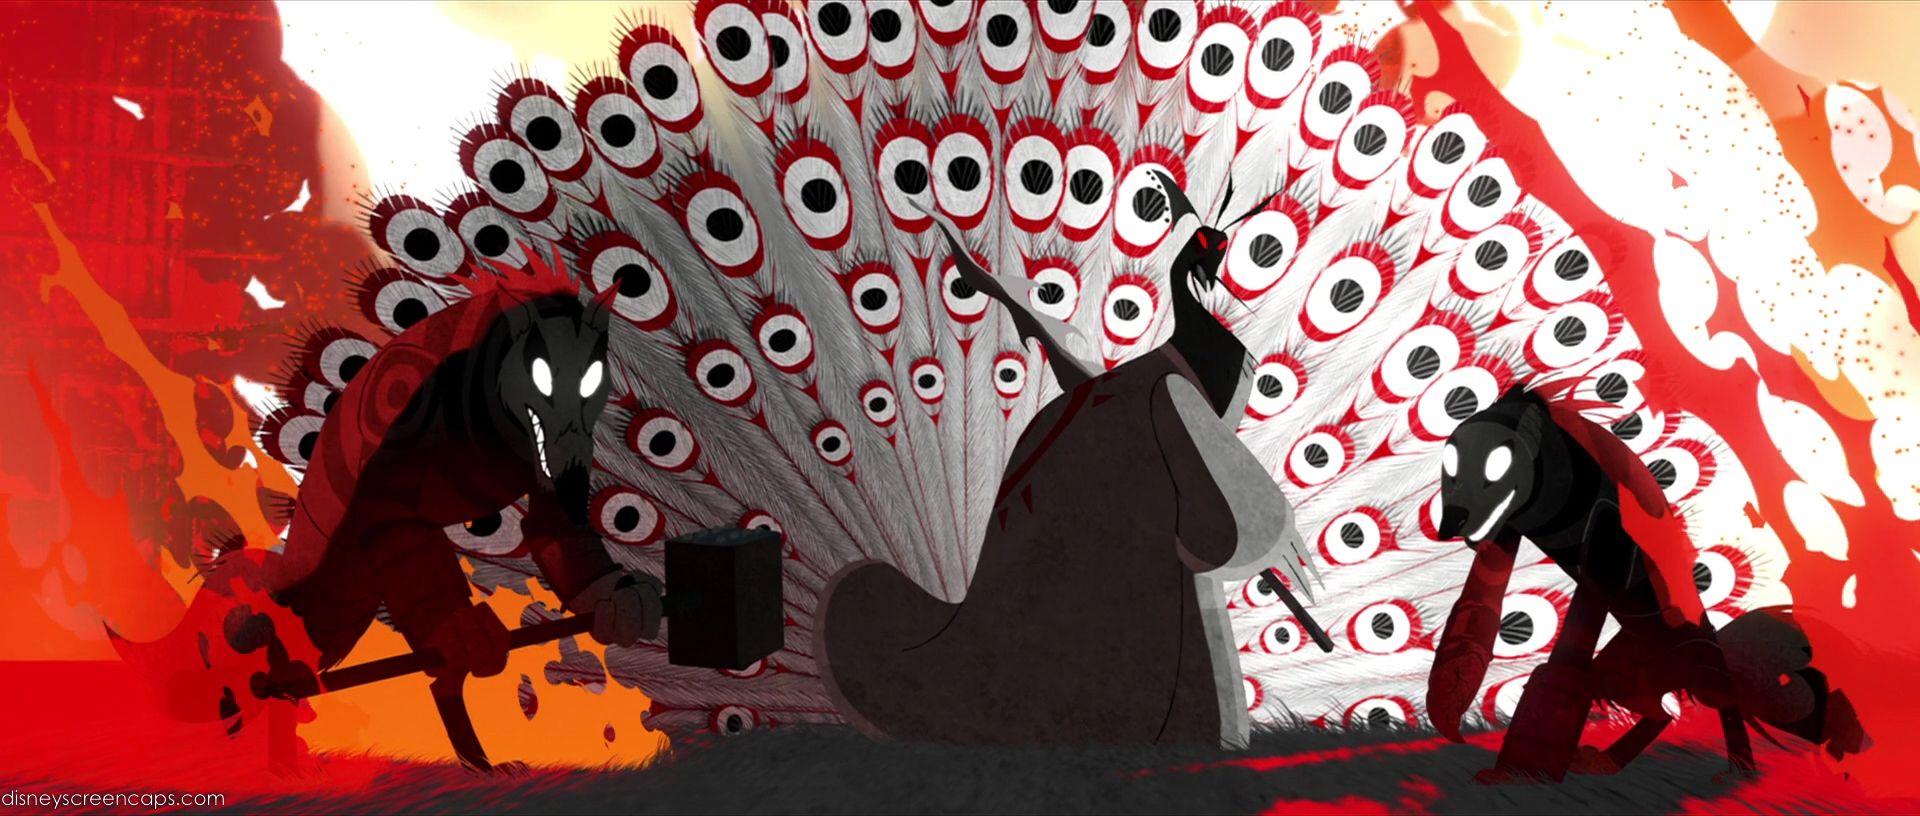 Kung Fu Panda 2 Screencap Lord Shen By Dashiesparkle Deviantart